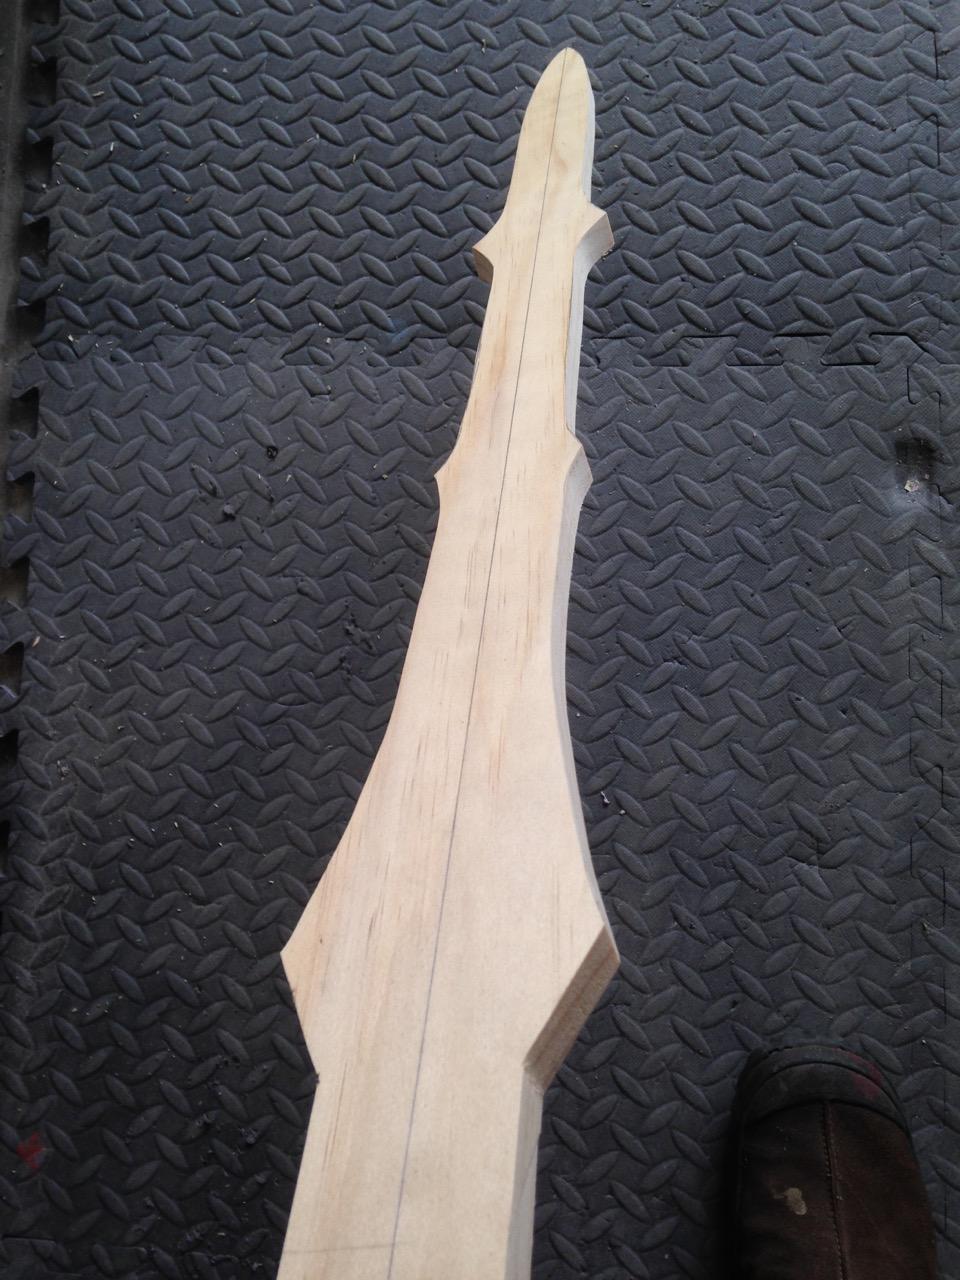 Rough cut with handheld saber saw.